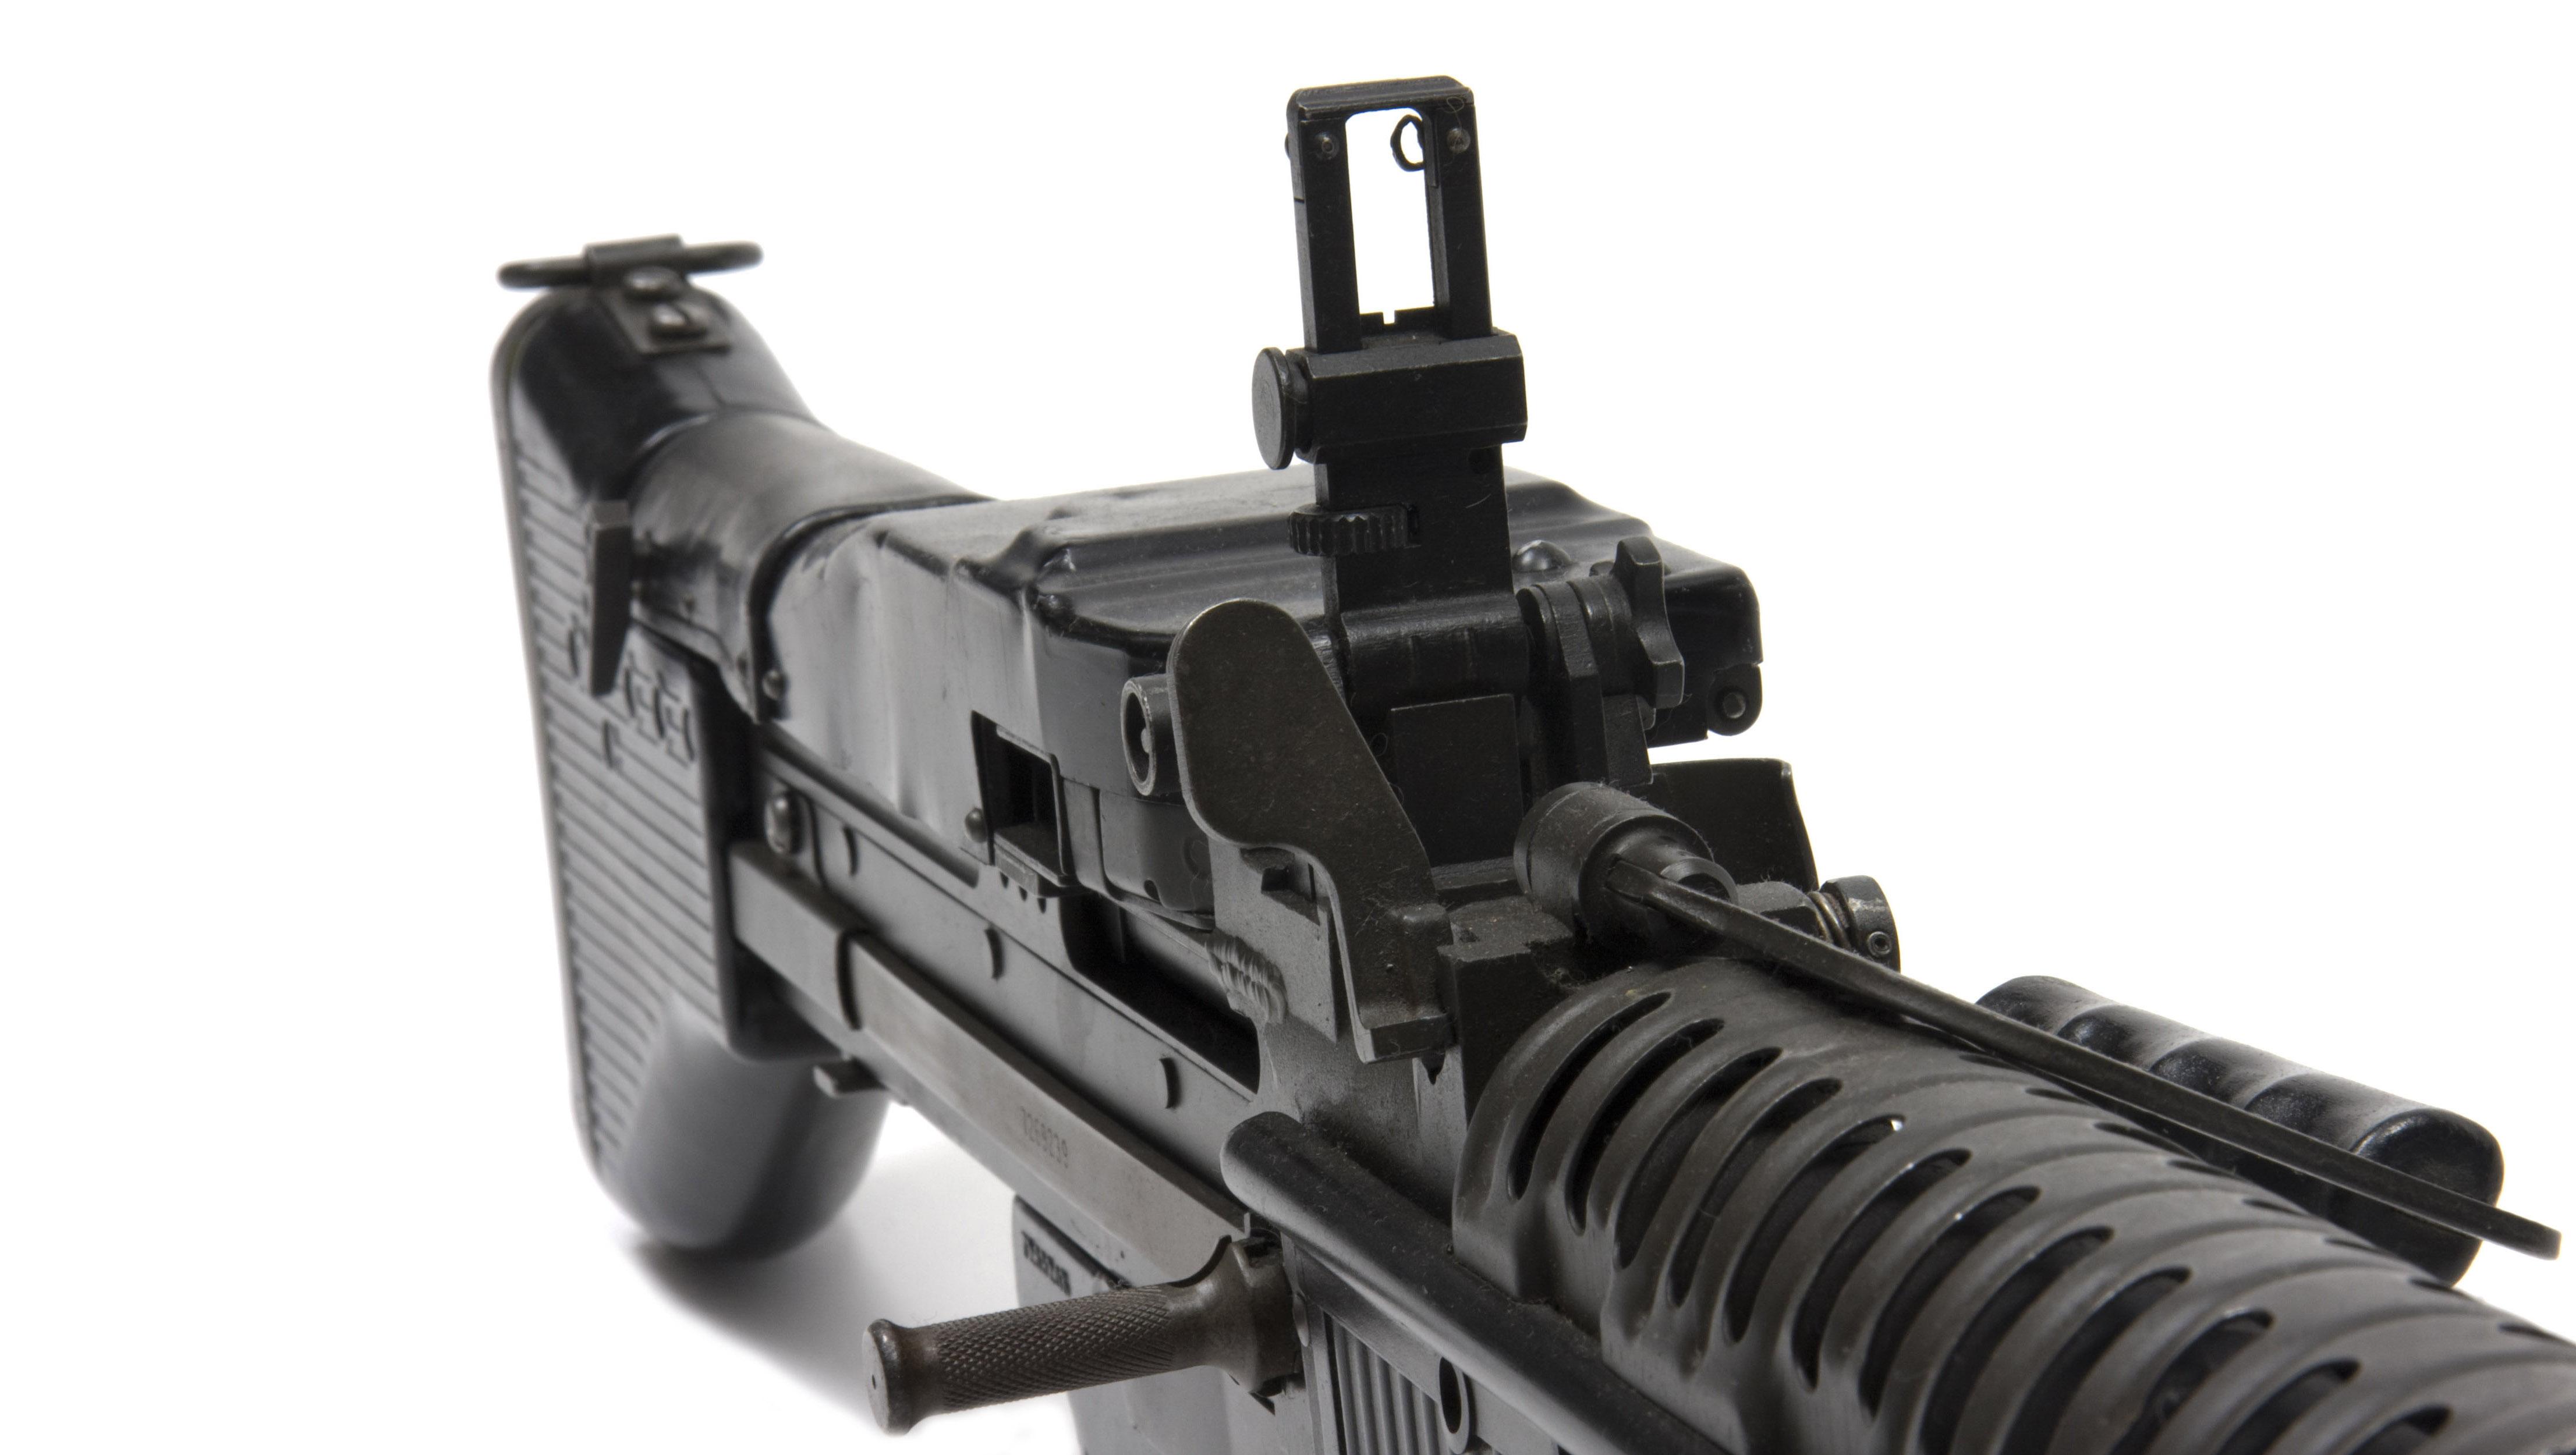 M60 MACHINE GUN military rifle weapon r wallpaper background 4425x2500